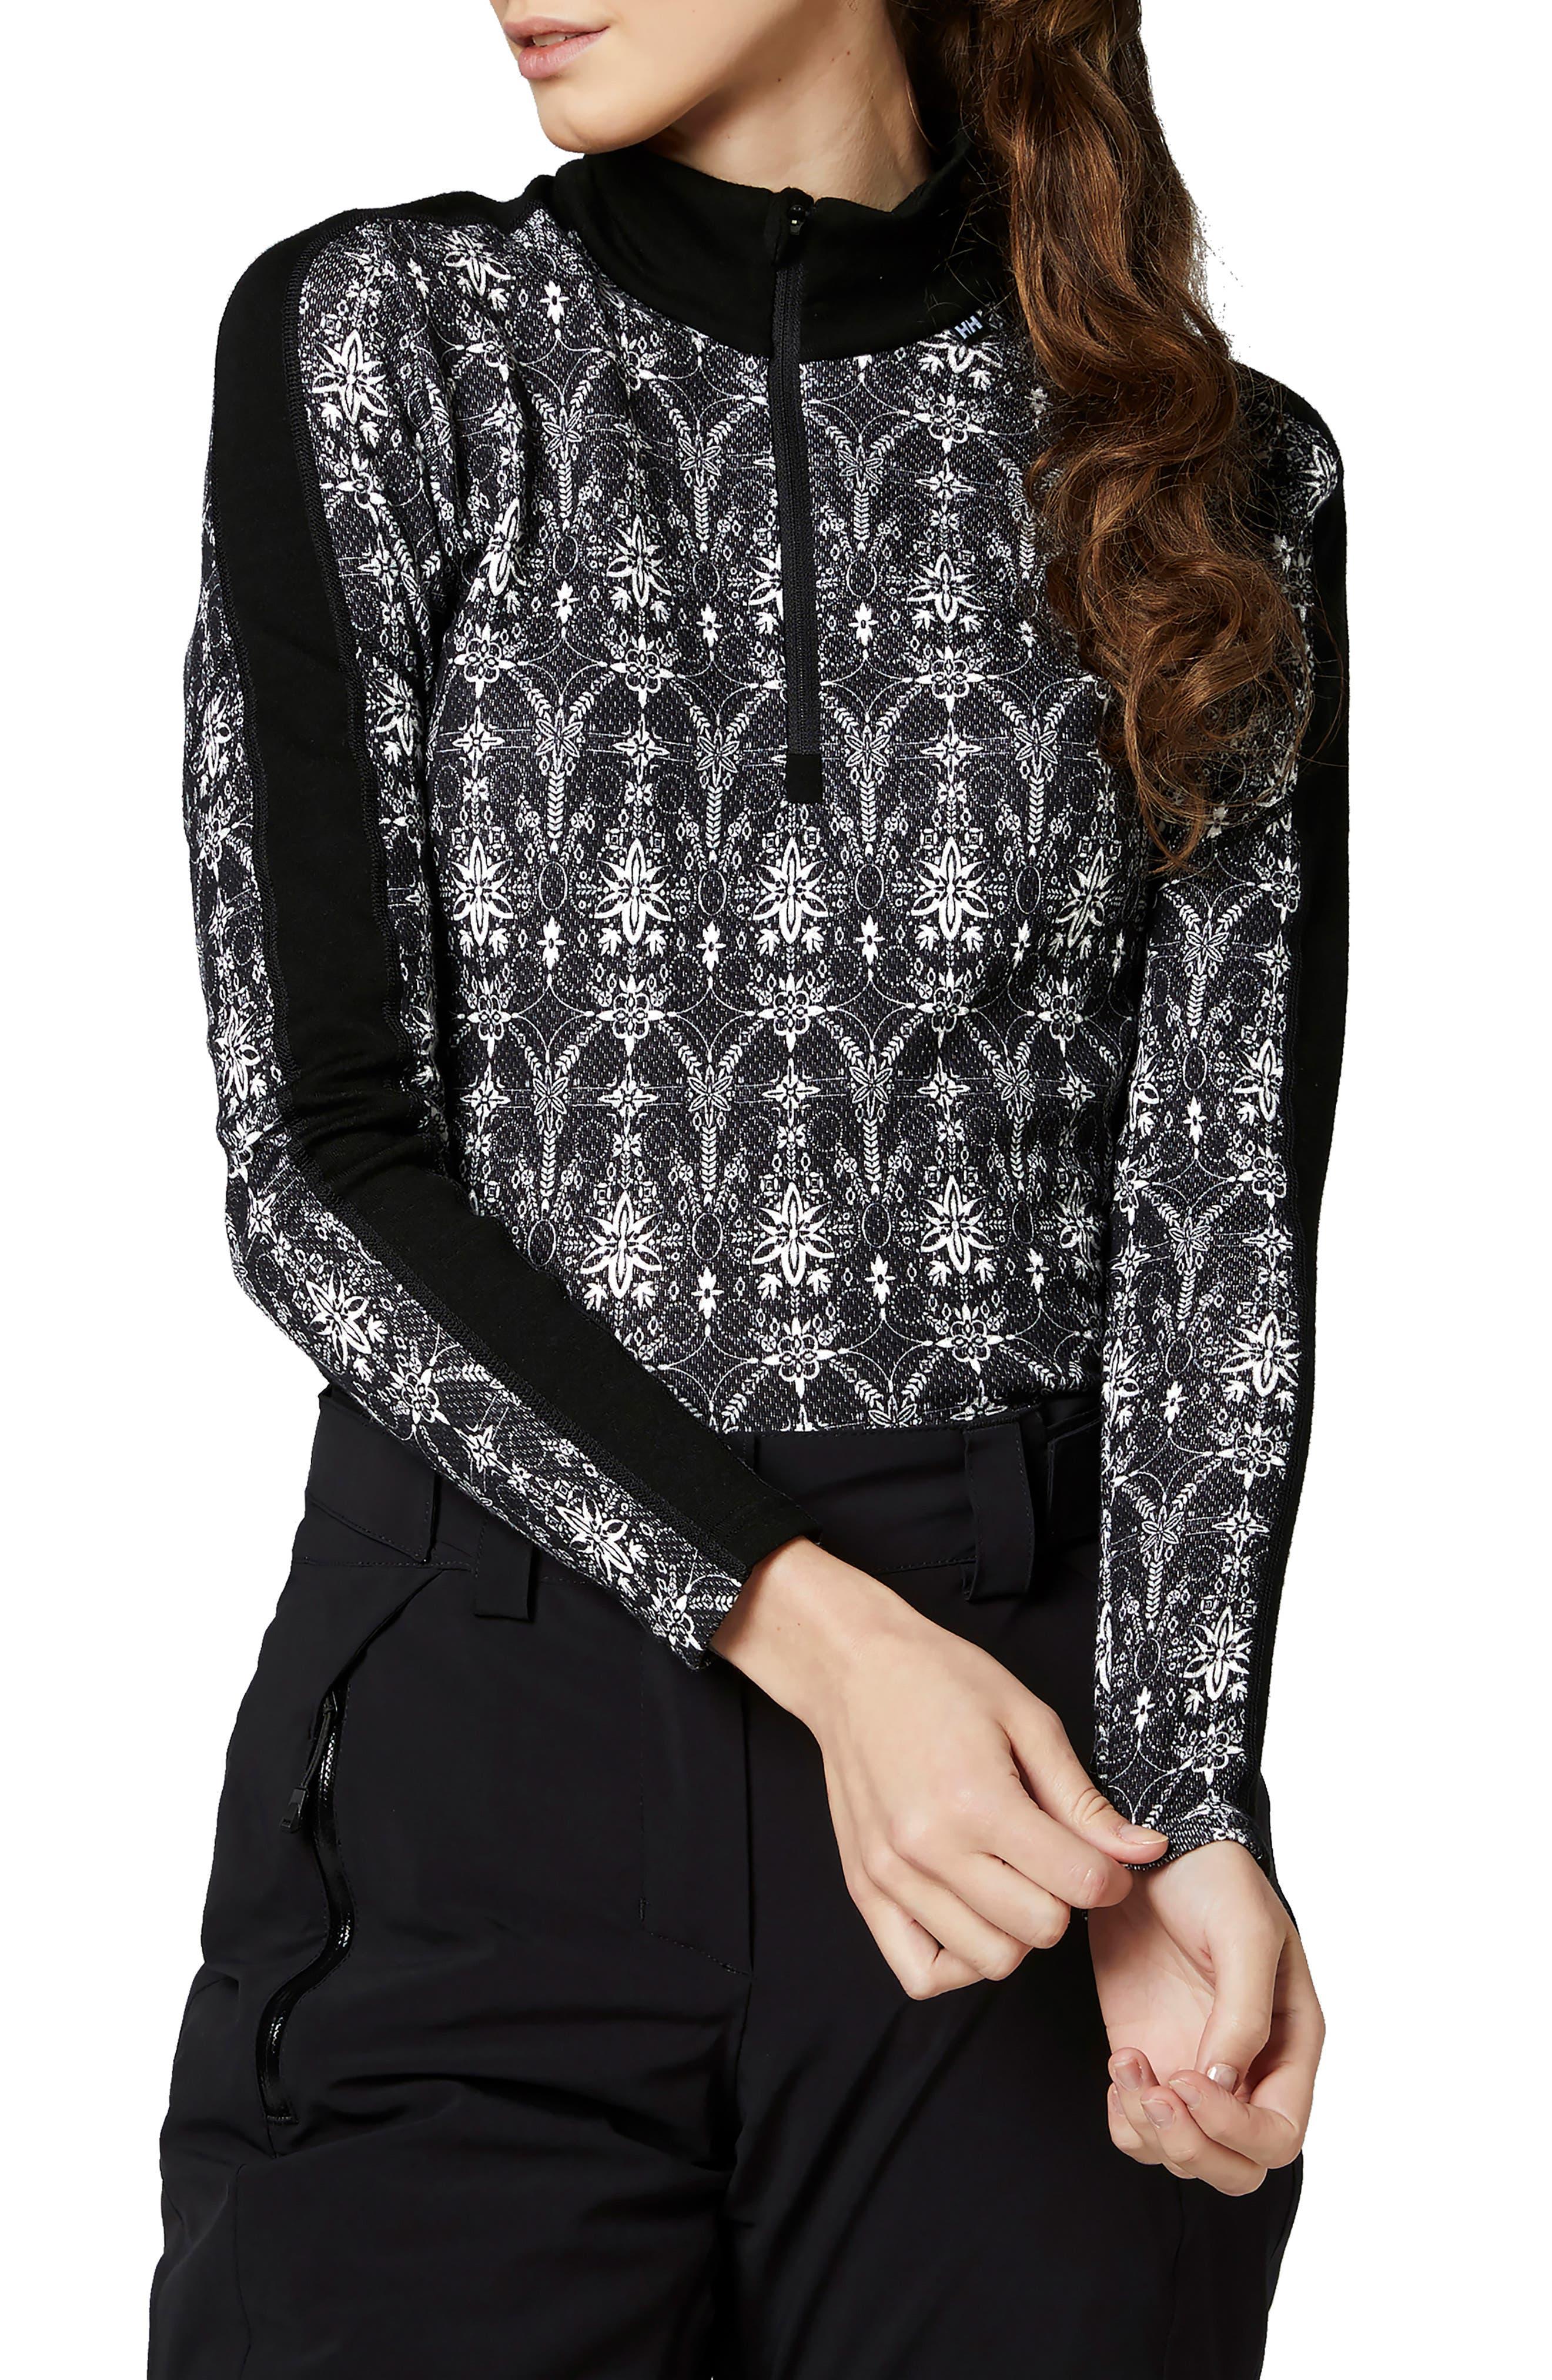 Helly Hansen Lifa Merino Wool Half Zip Pullover, Black